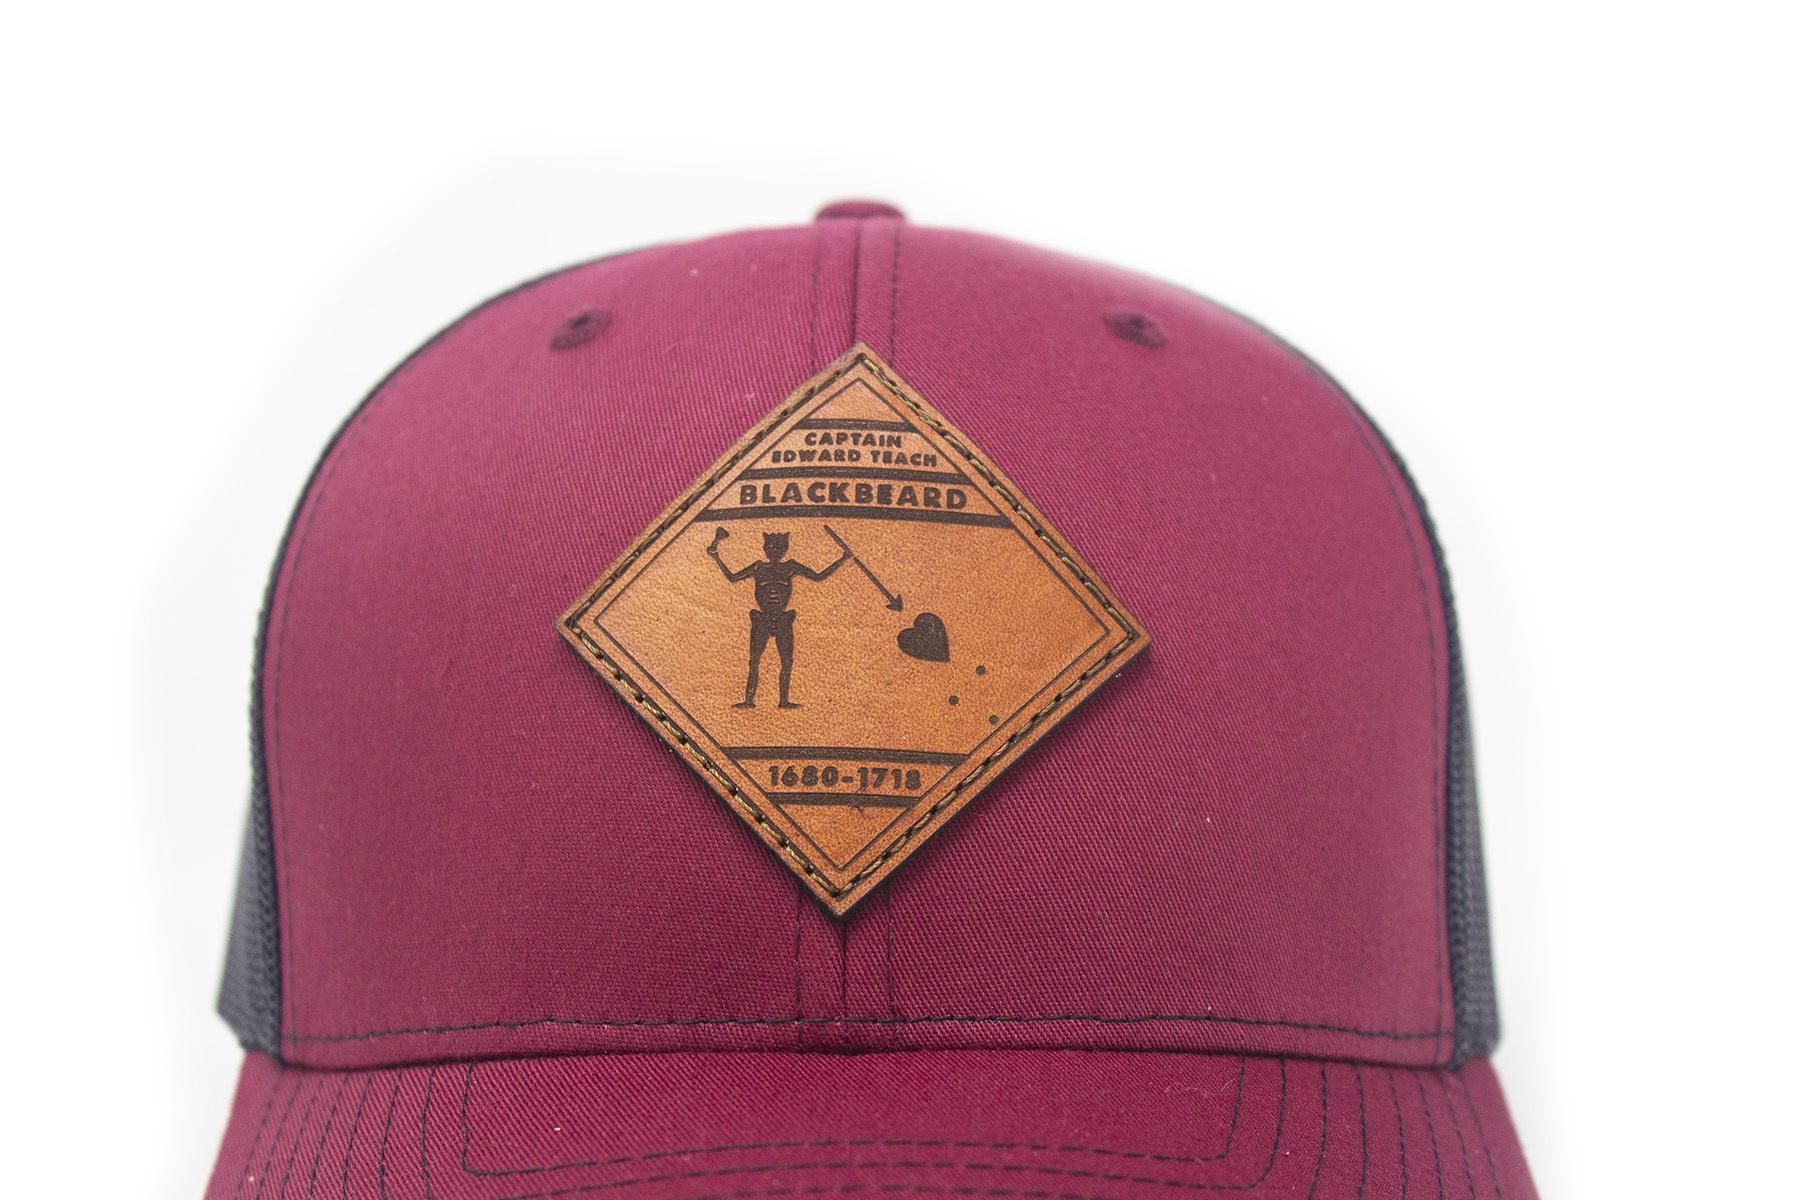 Blackbeard Leather Patch Lo Pro Trucker Hat, Cardinal and Black-3